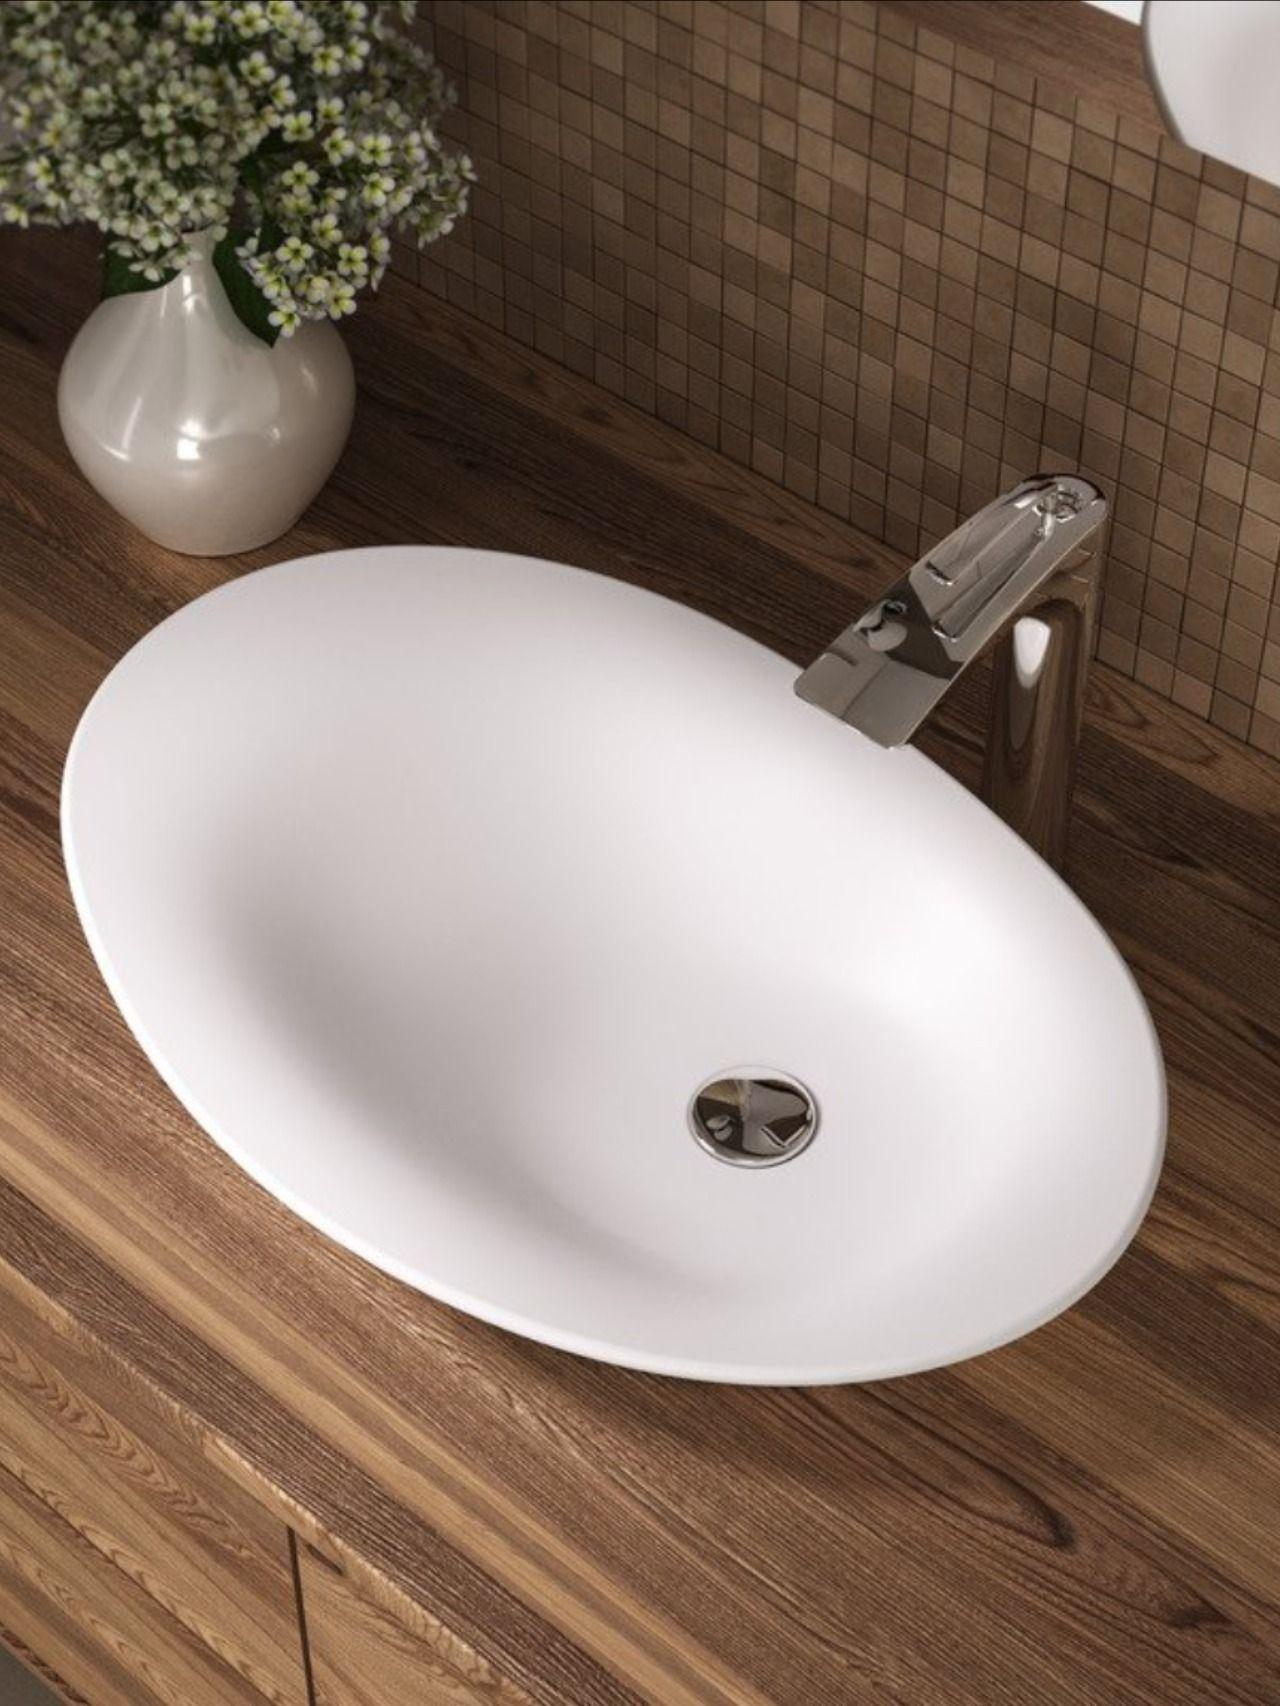 Aquatica Nanomorph Wht Stone Bathroom Vessel Sink